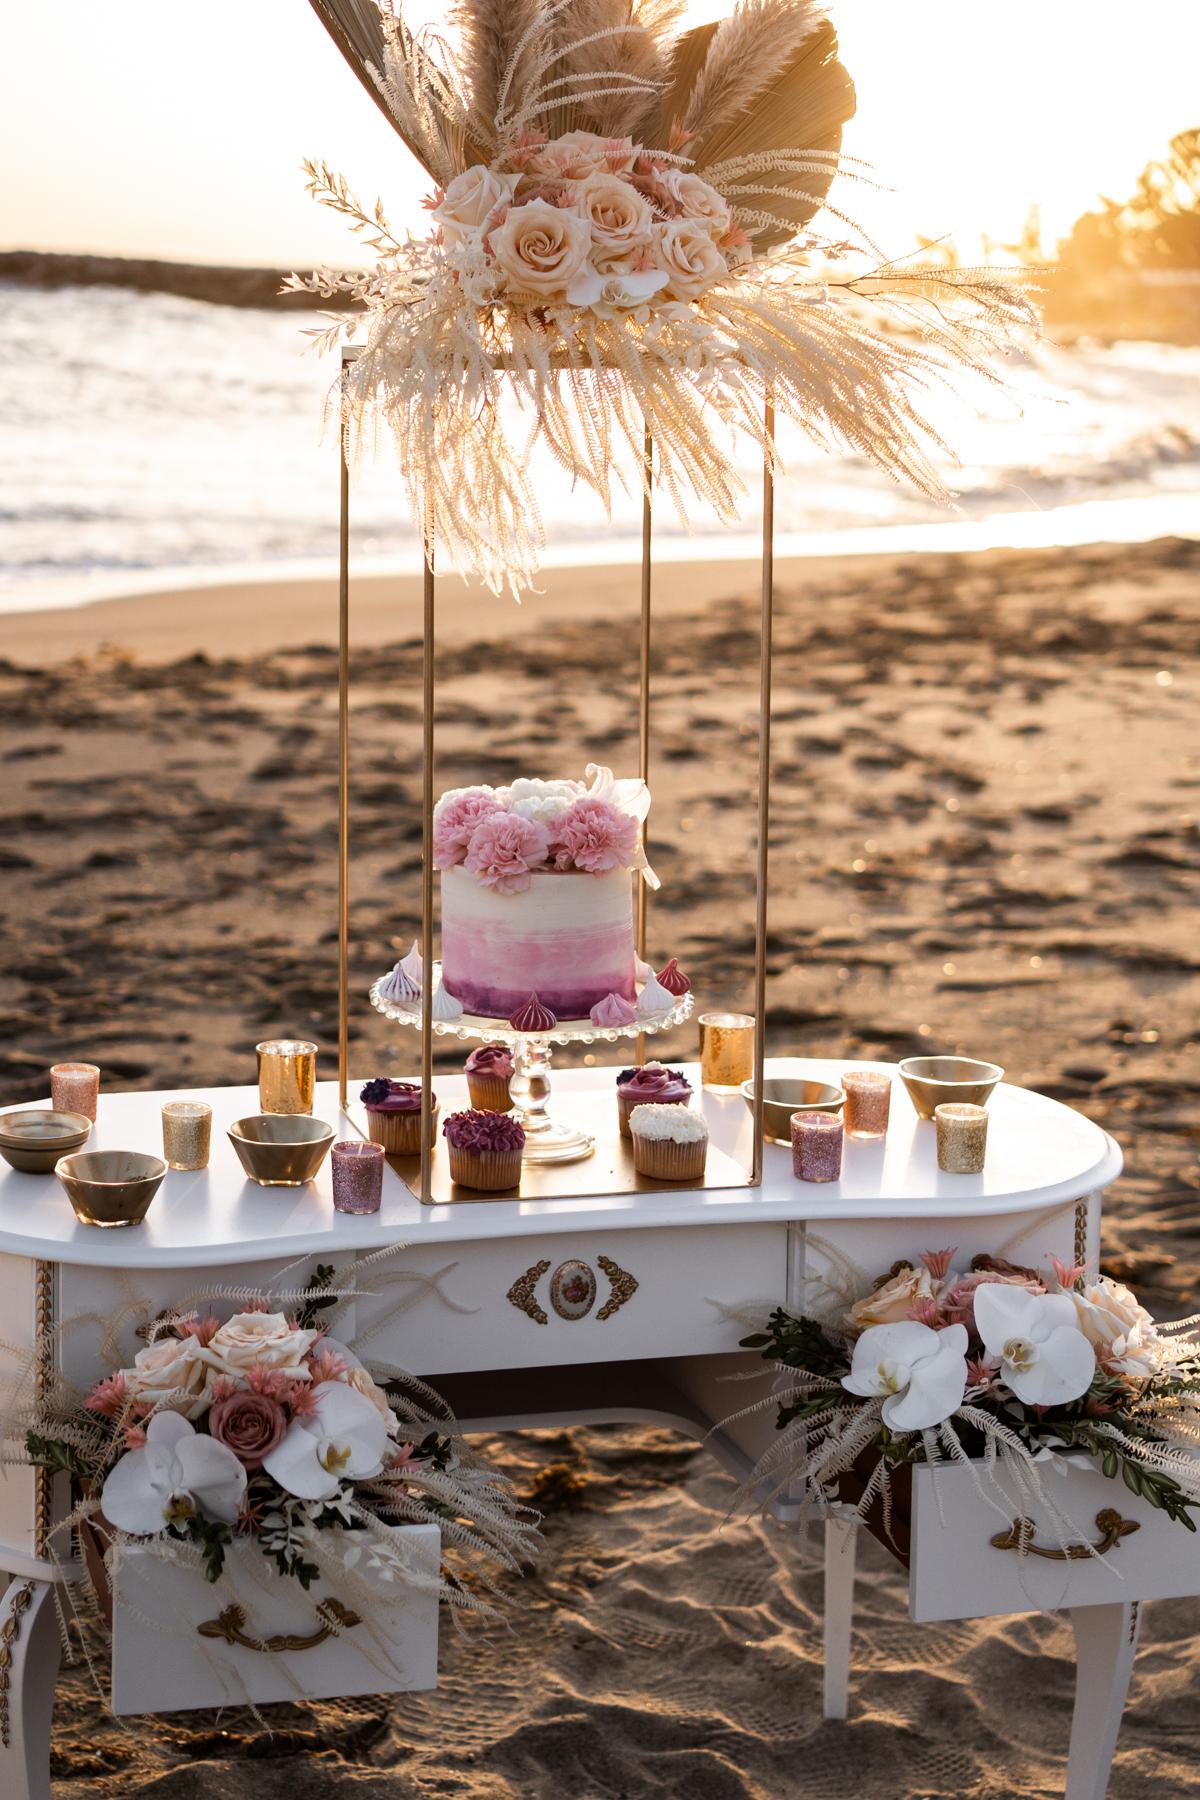 Camy wedding decor